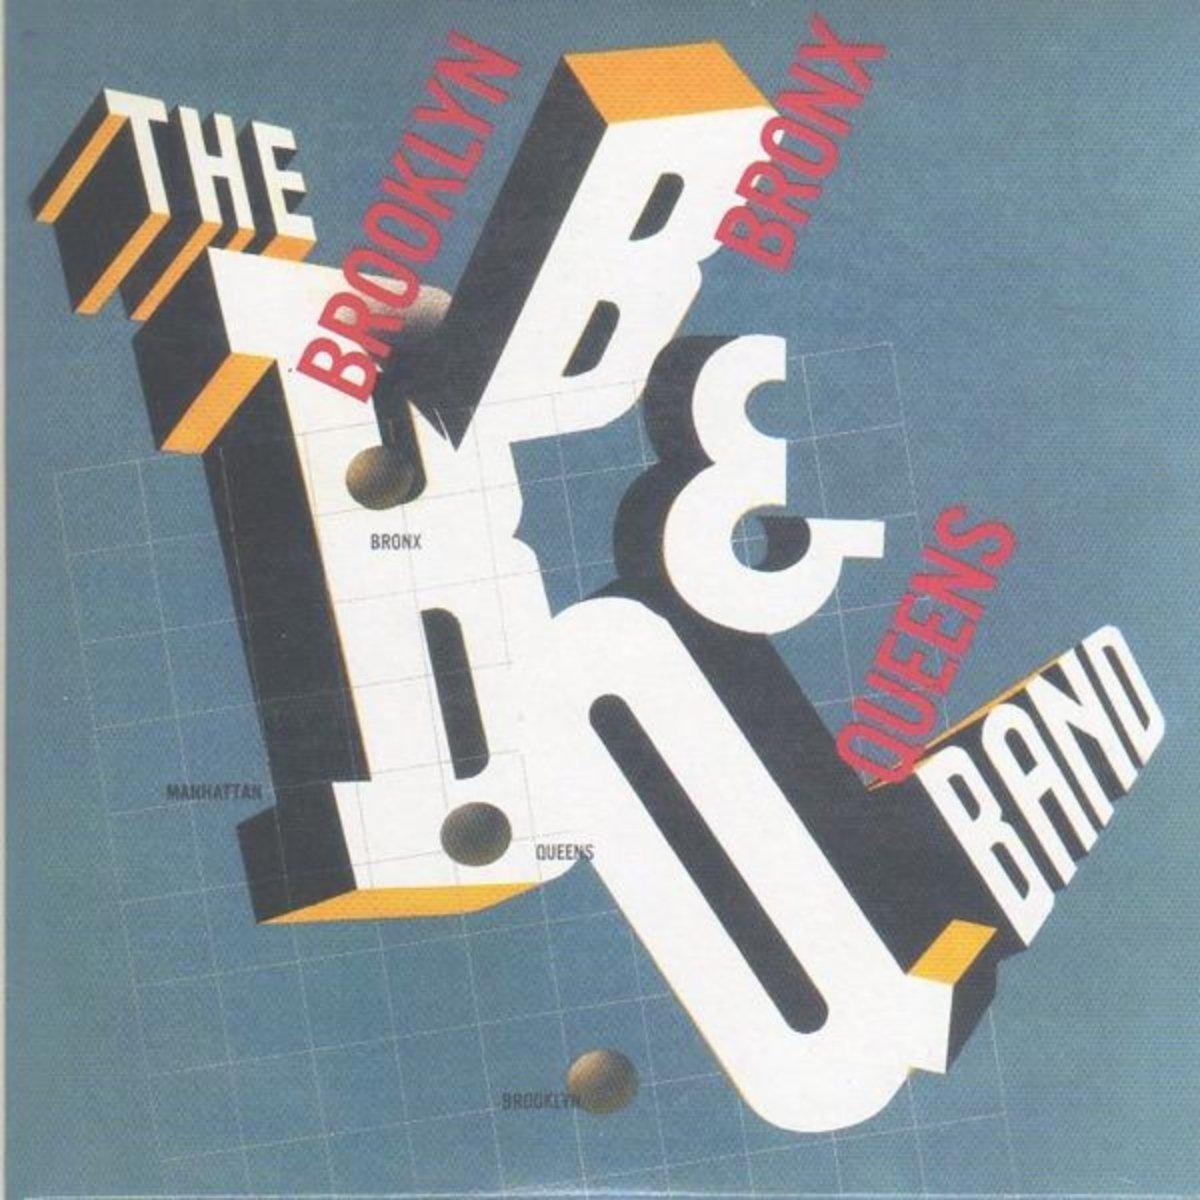 The B.B. & Q. Band – The B.B. & Q. Band (2005) [FLAC]